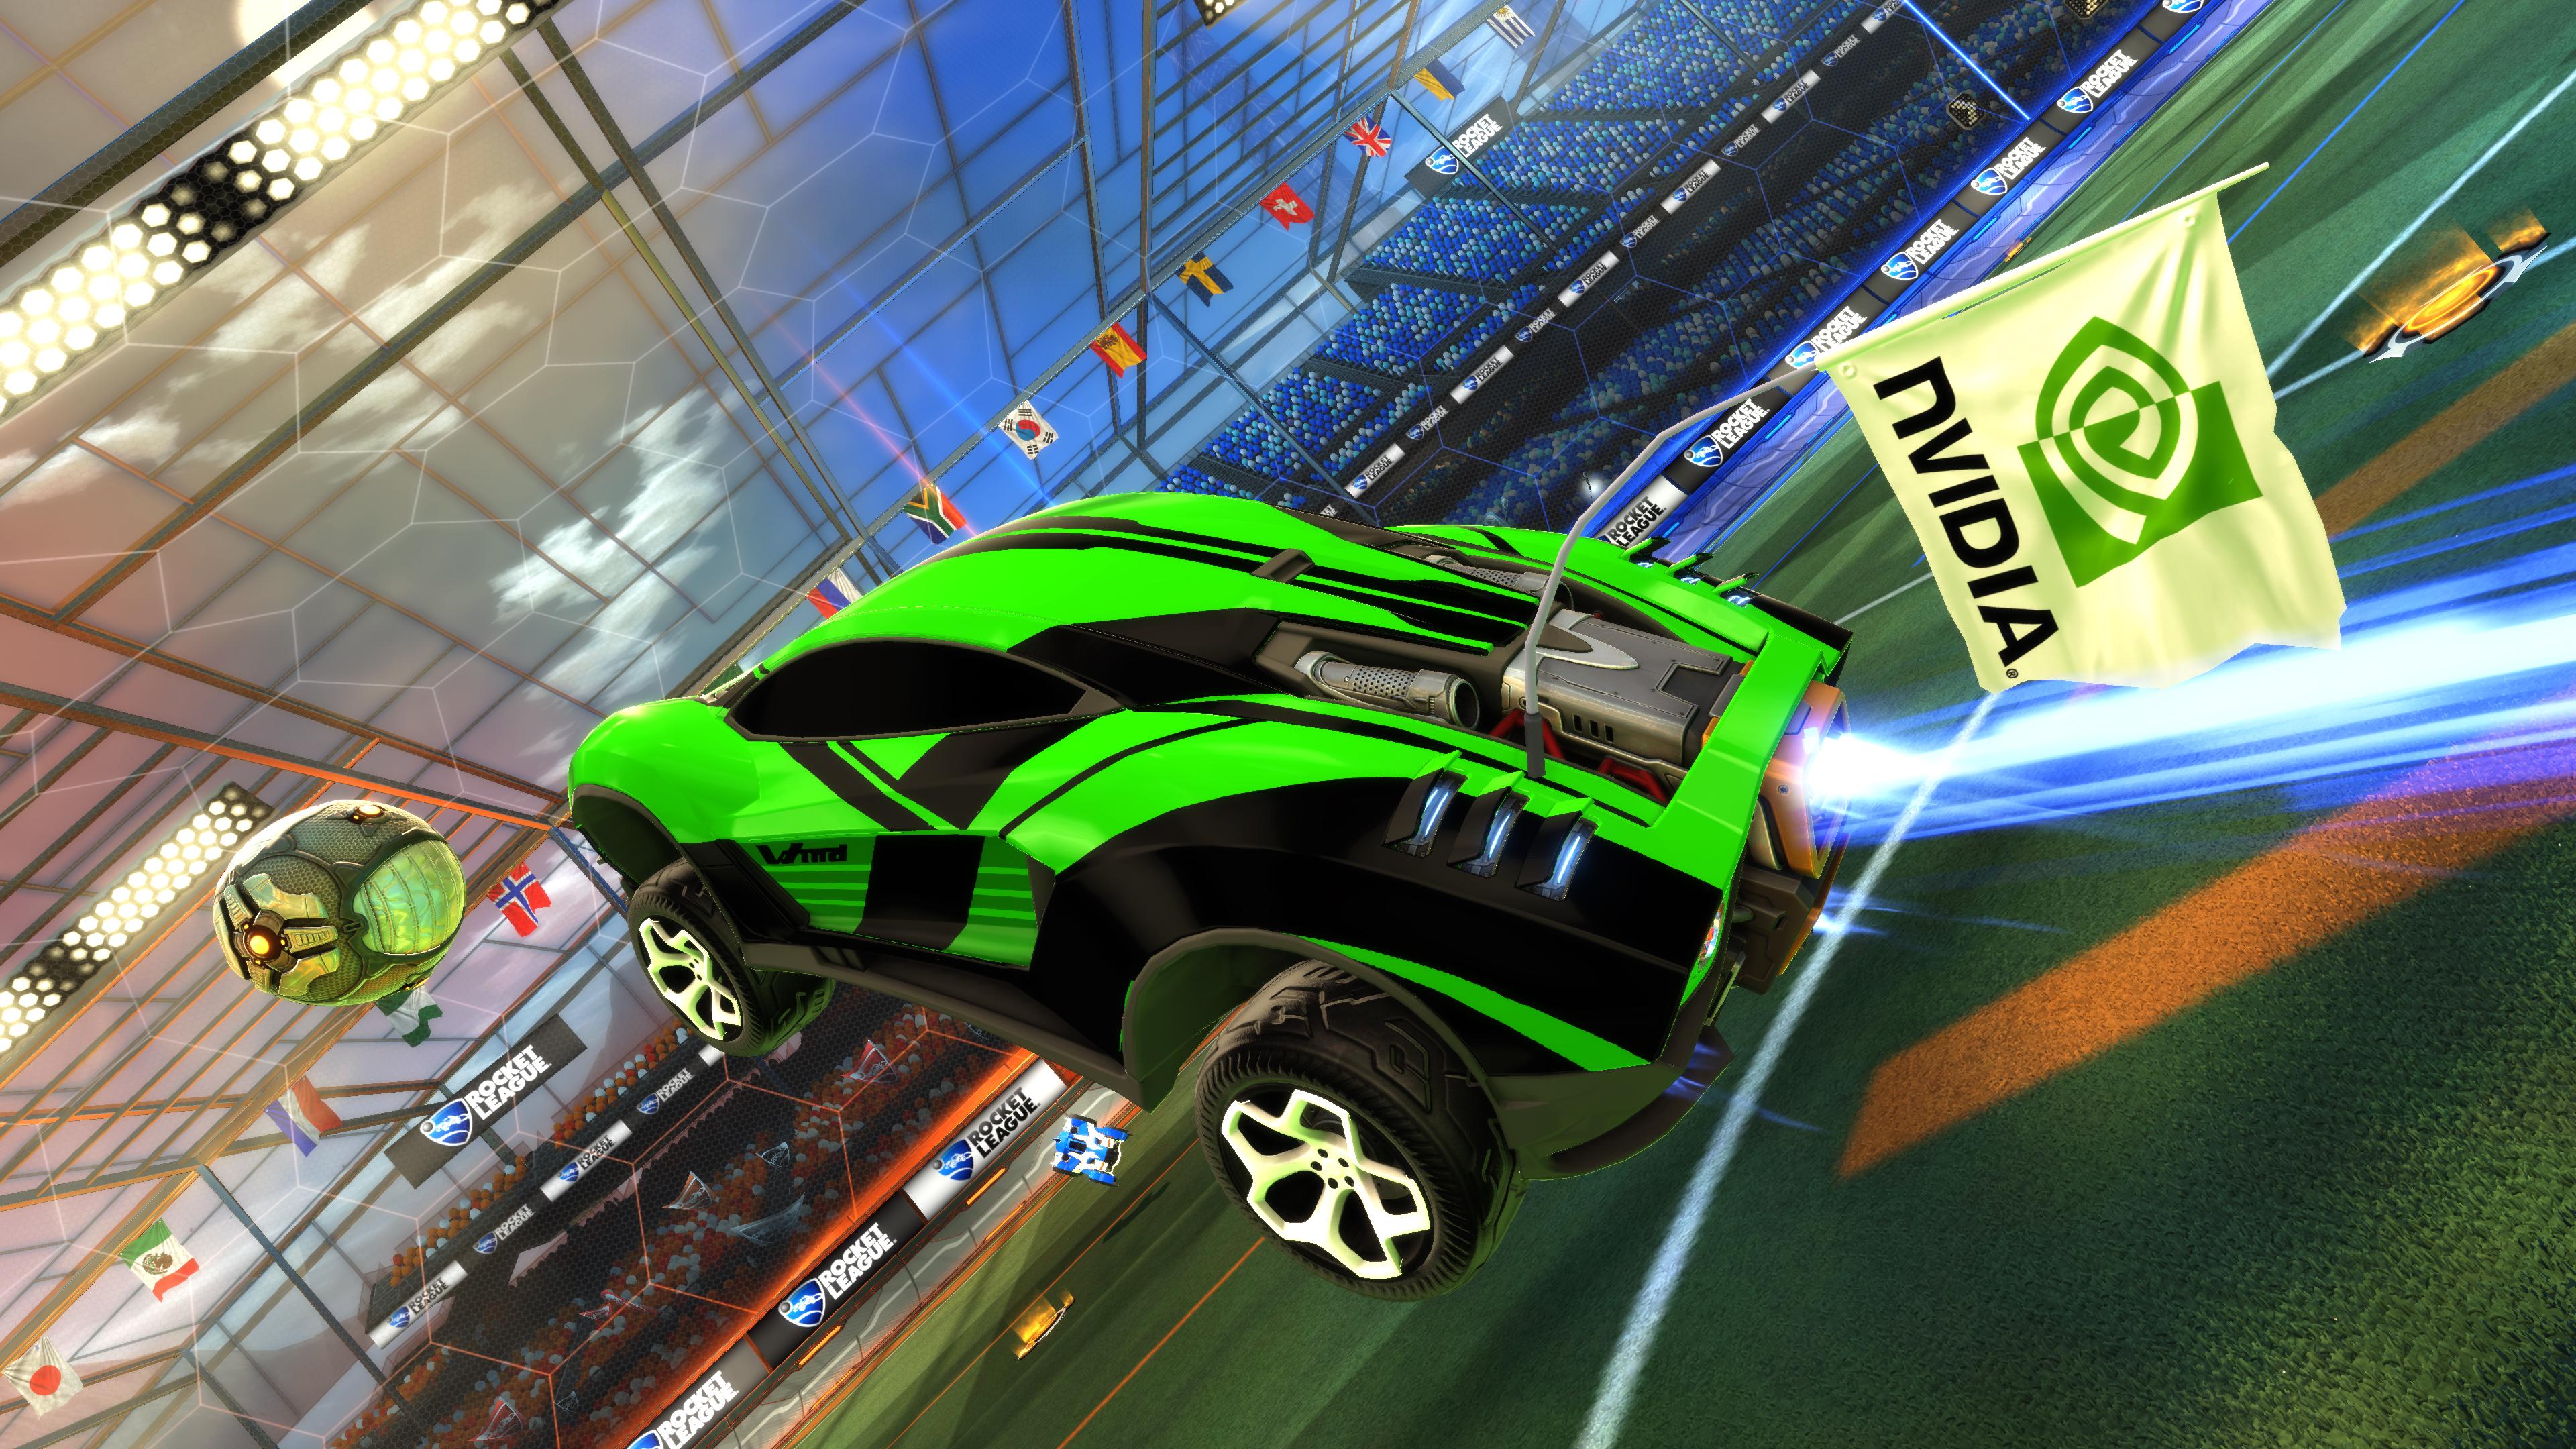 Rocket League GeForce GTX Bundle: Get The Game For Free